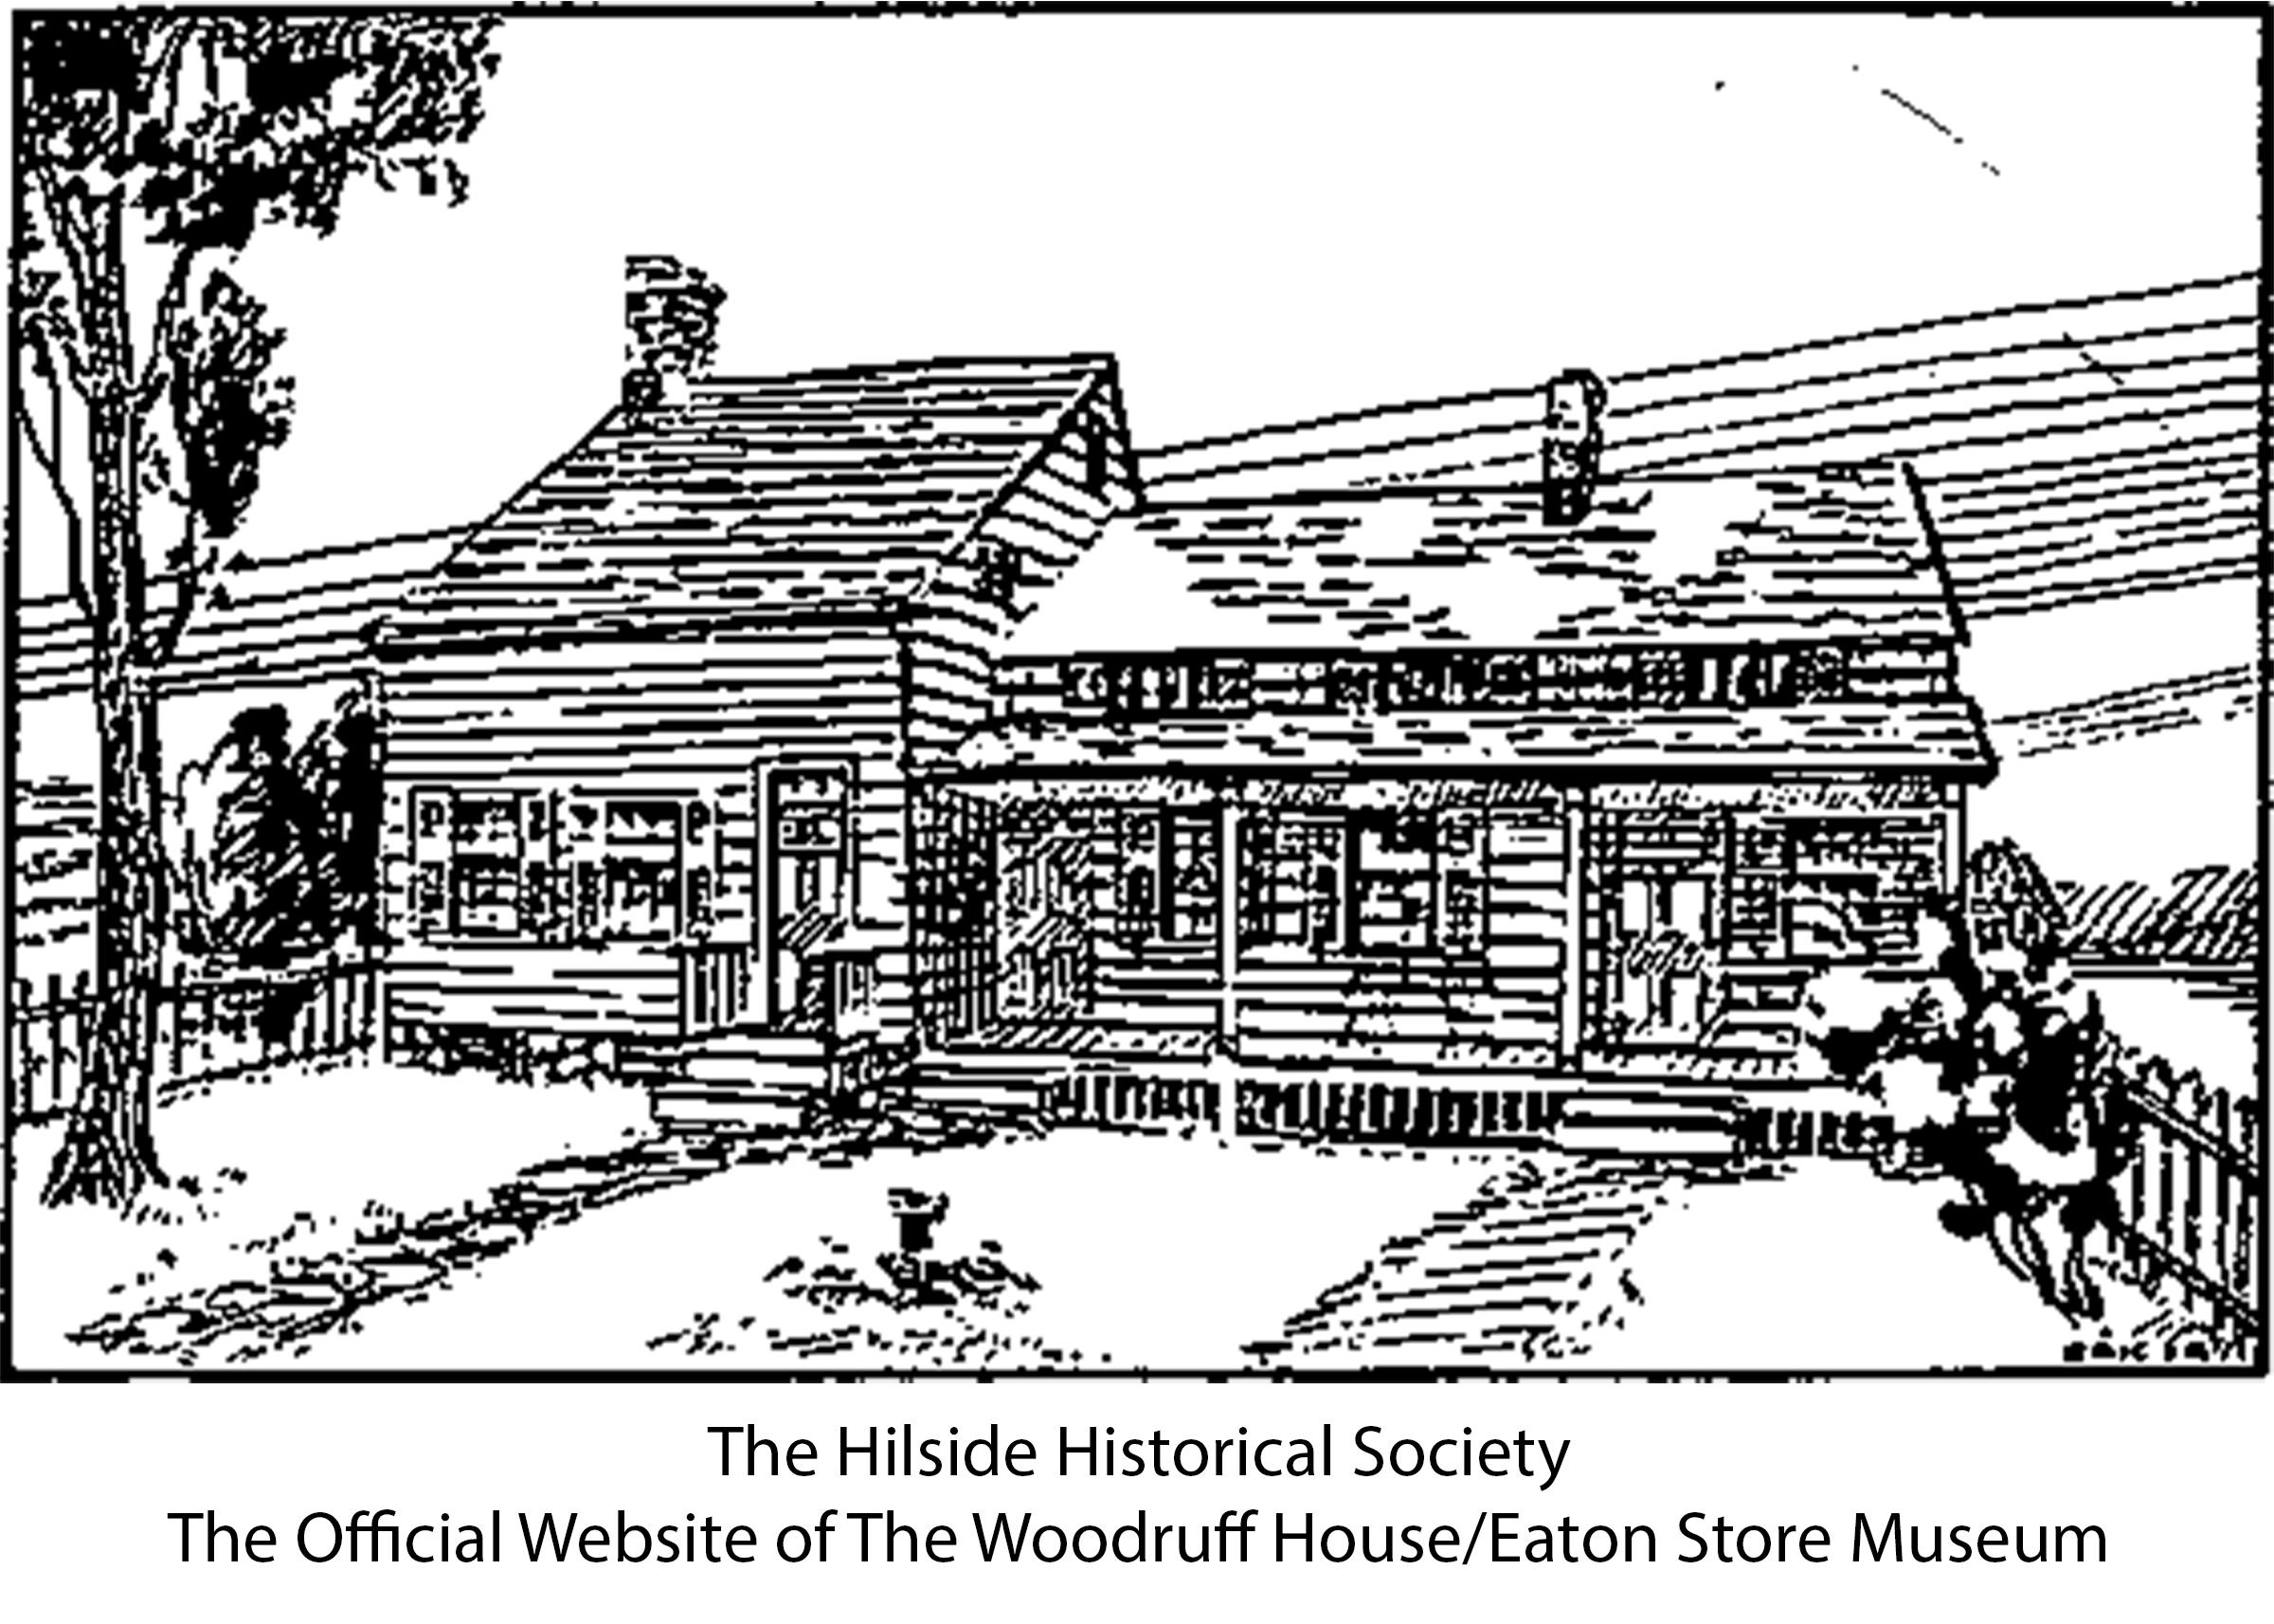 The Hillside Historical Society